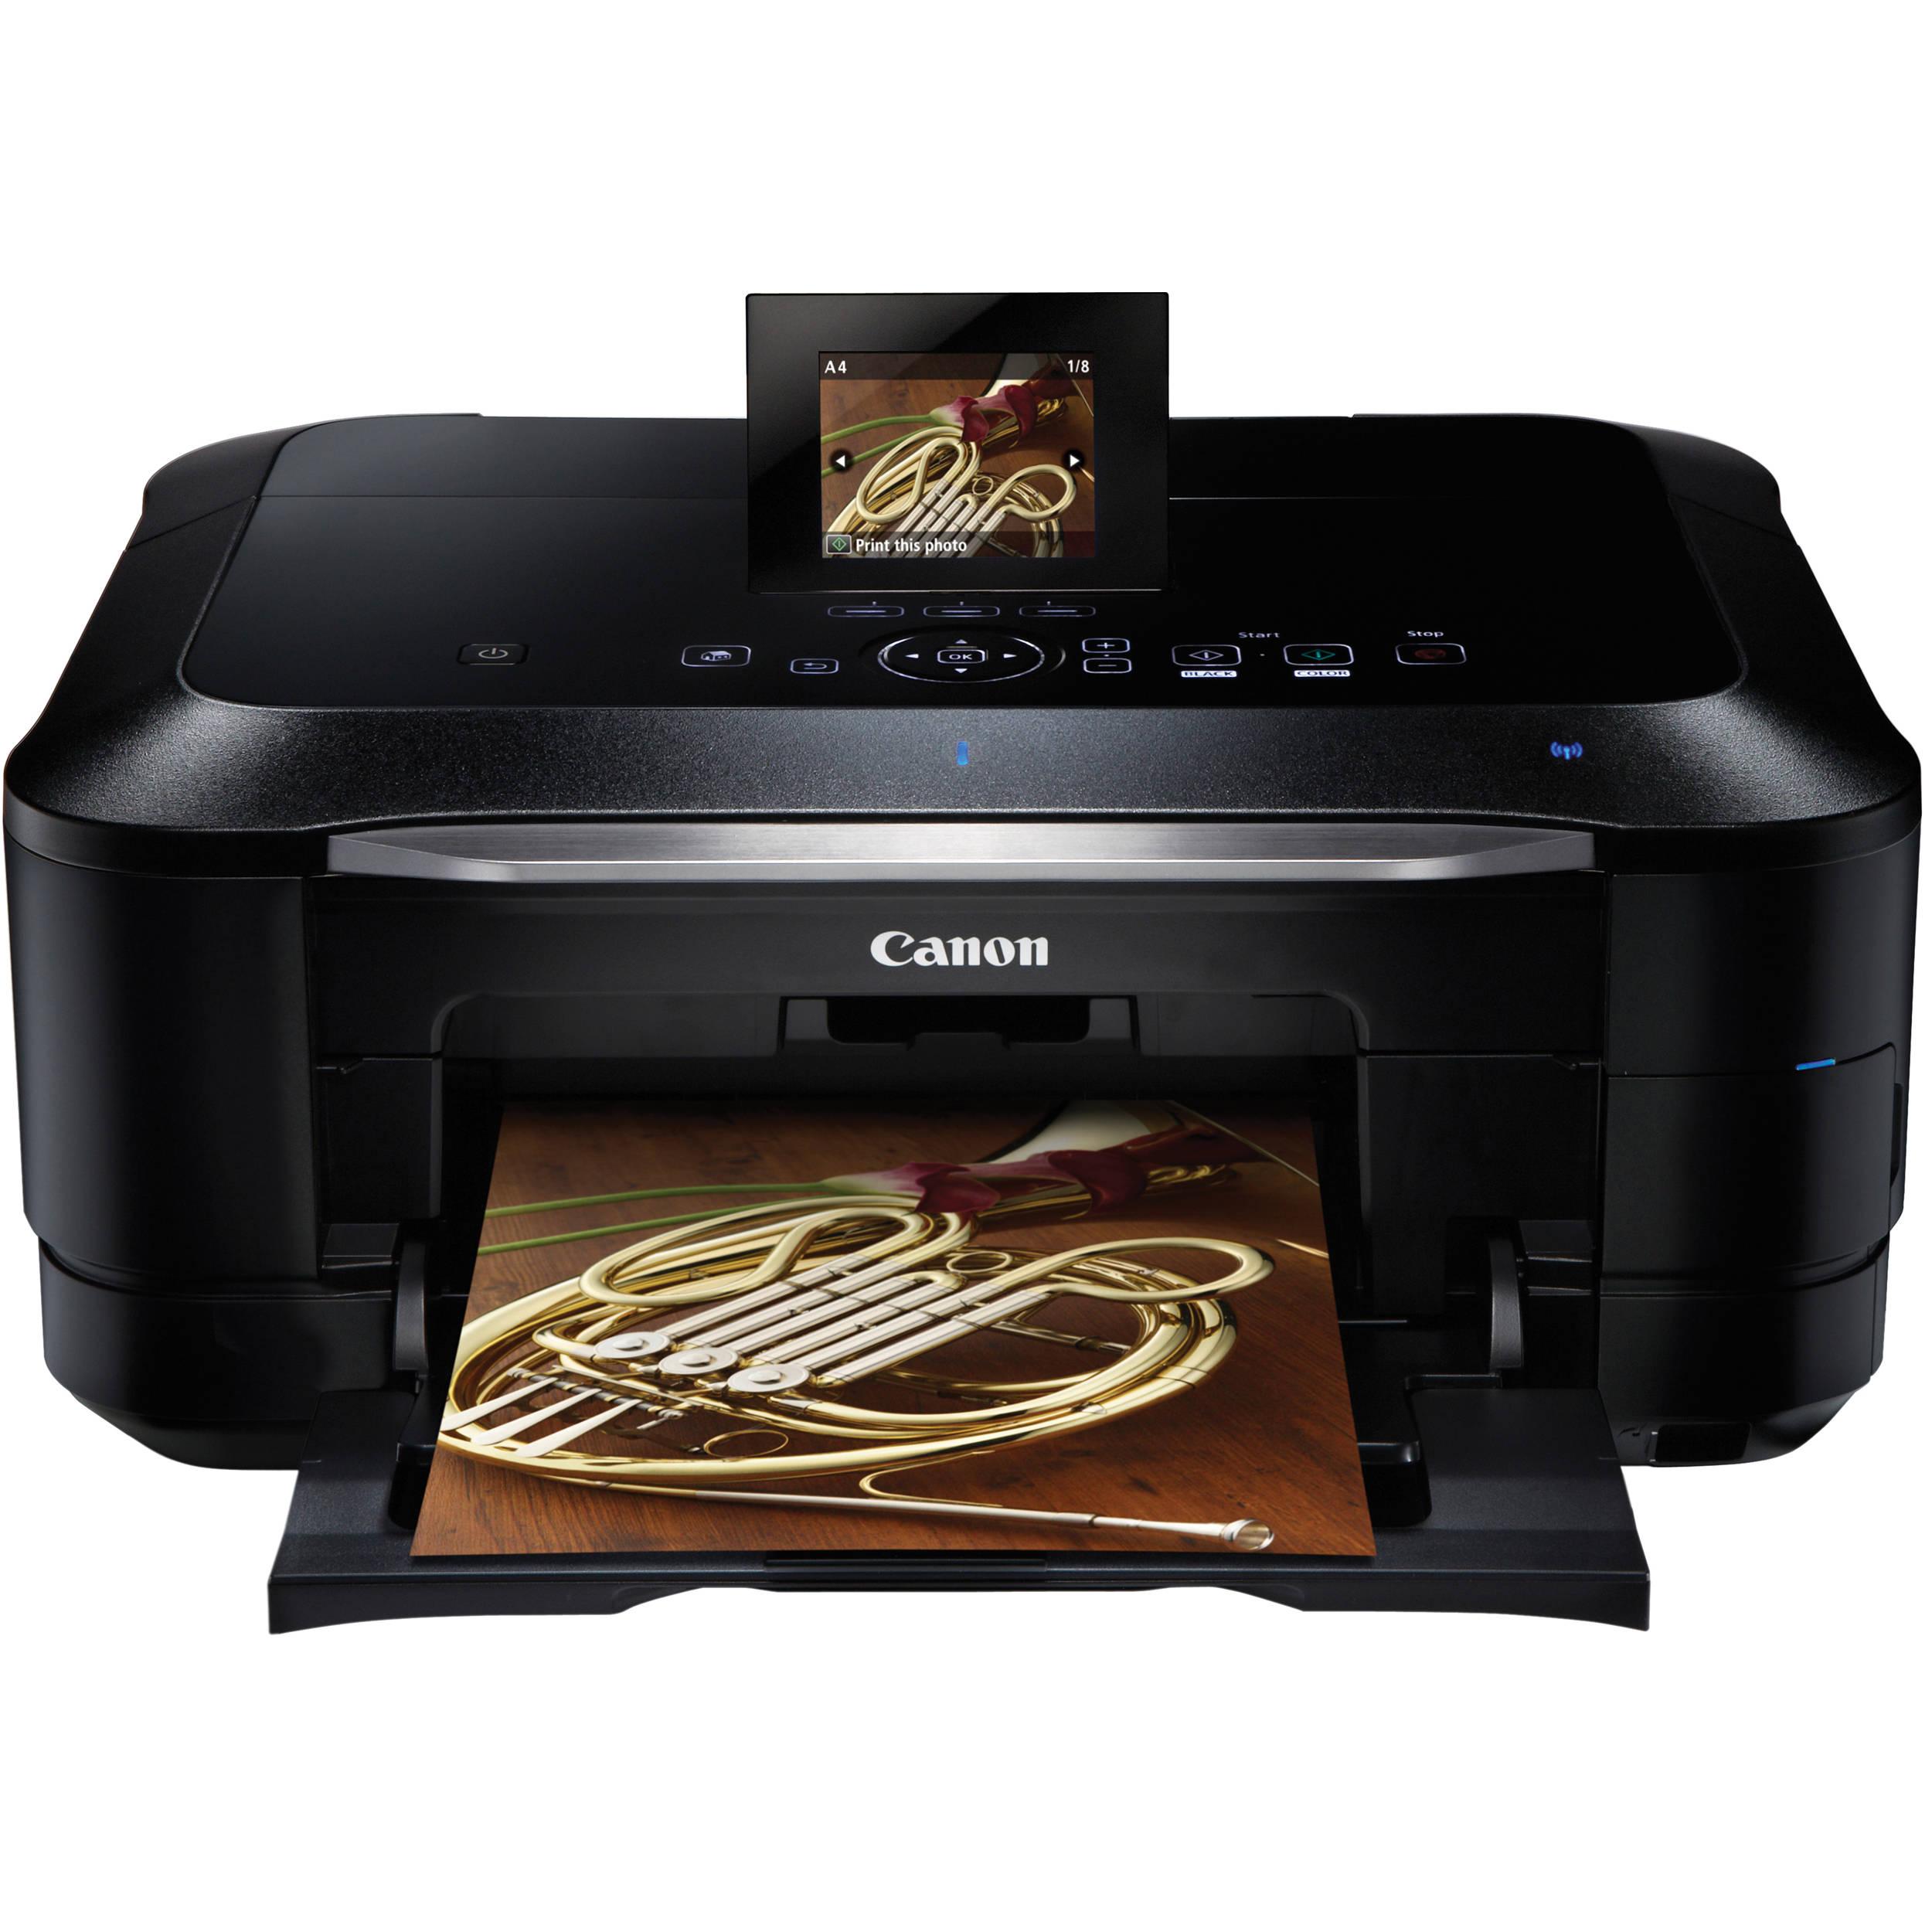 canon pixma mg8220 wireless color all in one inkjet 5293b002 b h rh bhphotovideo com canon pixma mg8200 manual Canon PIXMA Printer Ink Cartridges